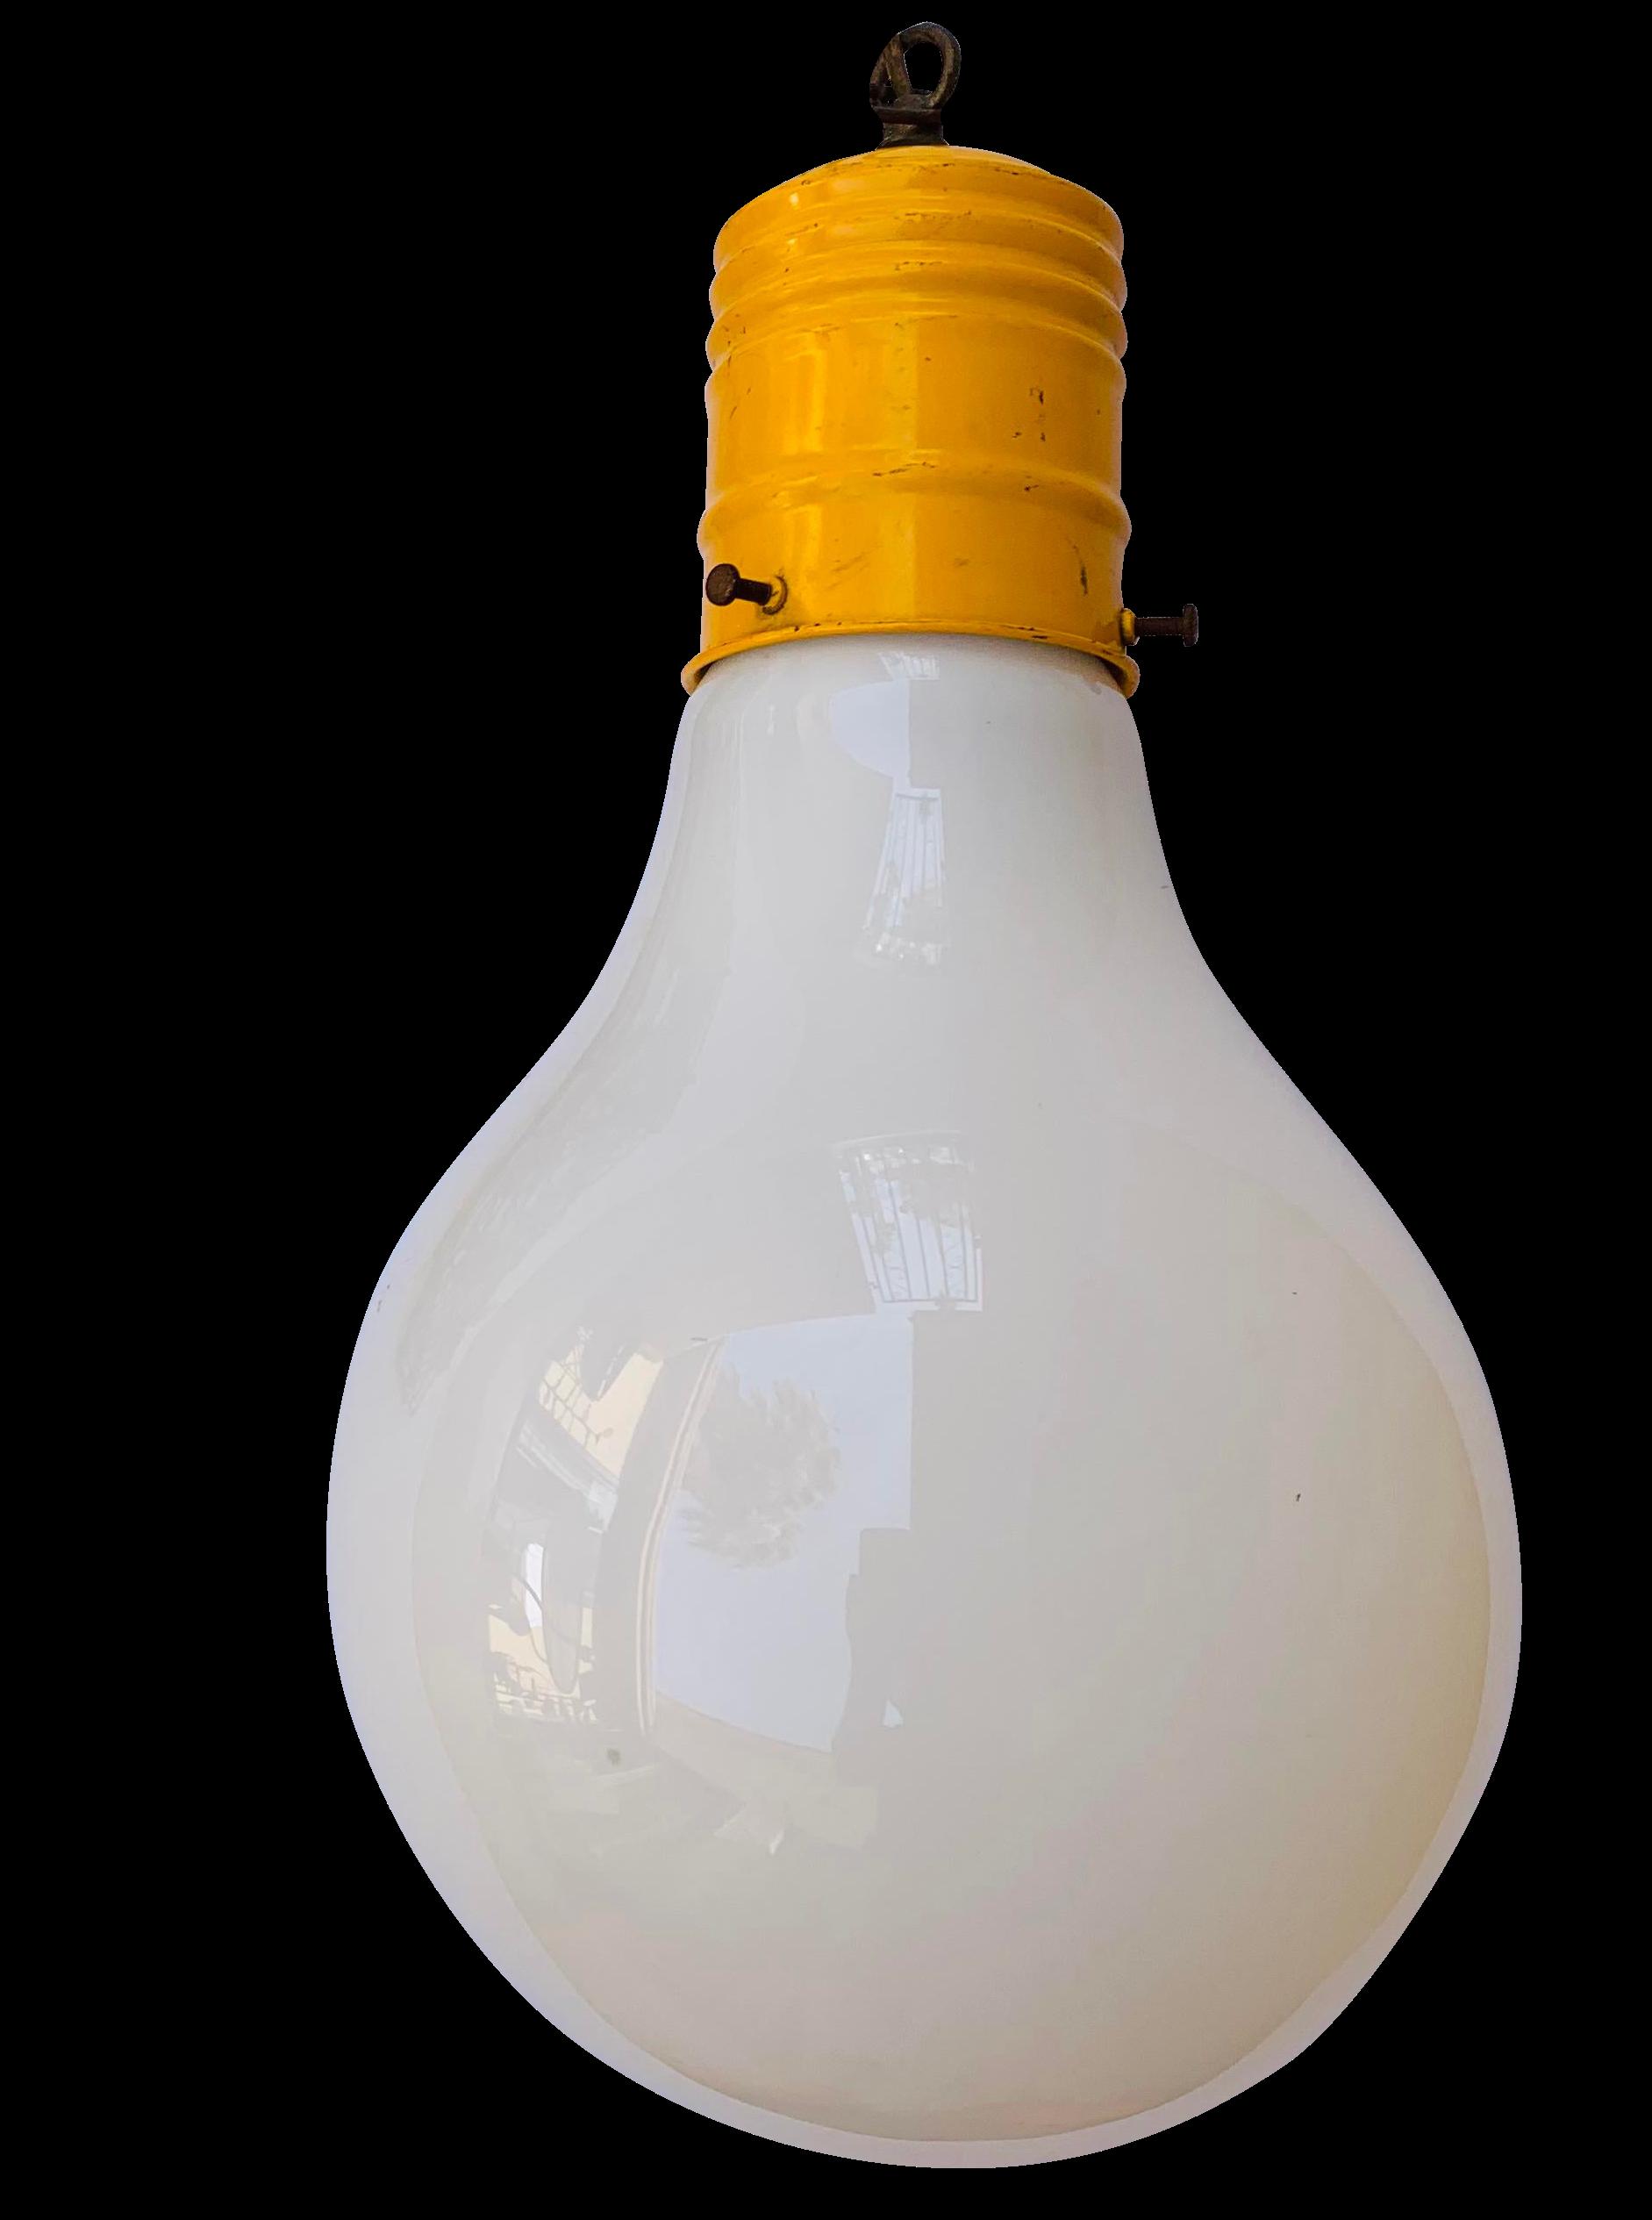 Vintage Mid Century Pop Art Giant Hanging Lightbulb Lamp